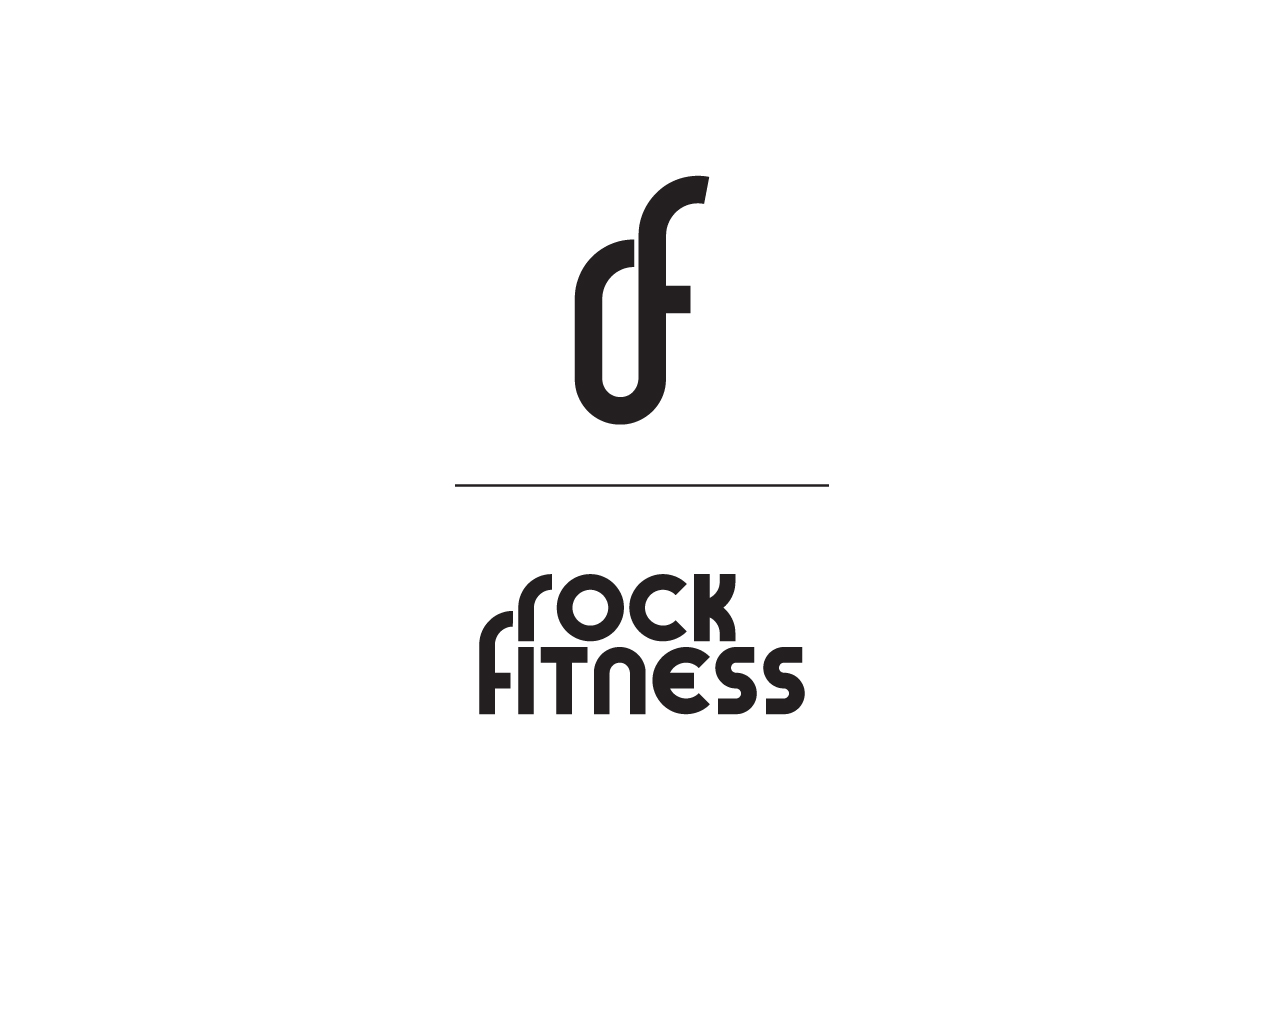 ROCK_FITNESS_LOGO.jpg